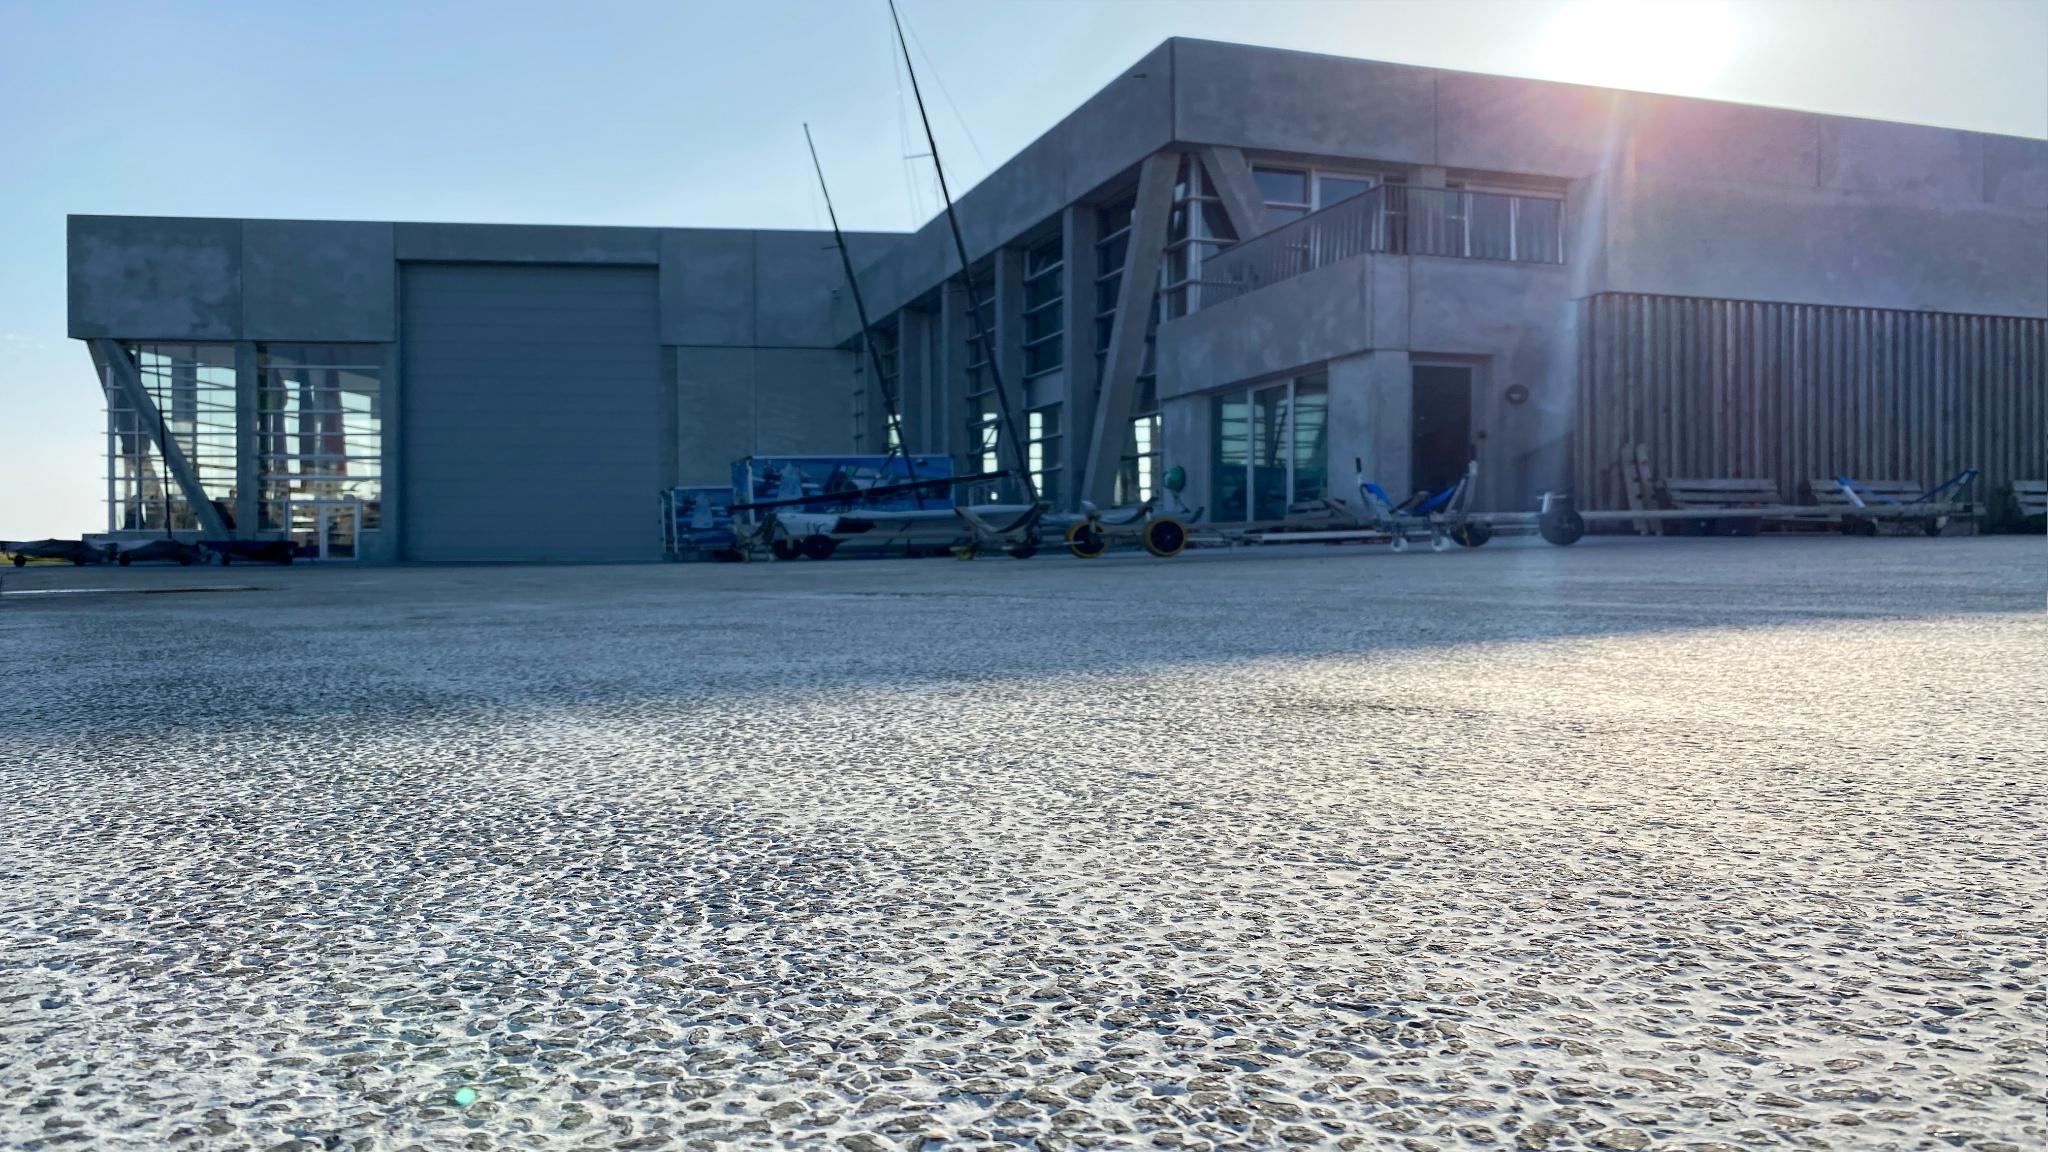 2_Confalt foran Århus Sejlsportscenter